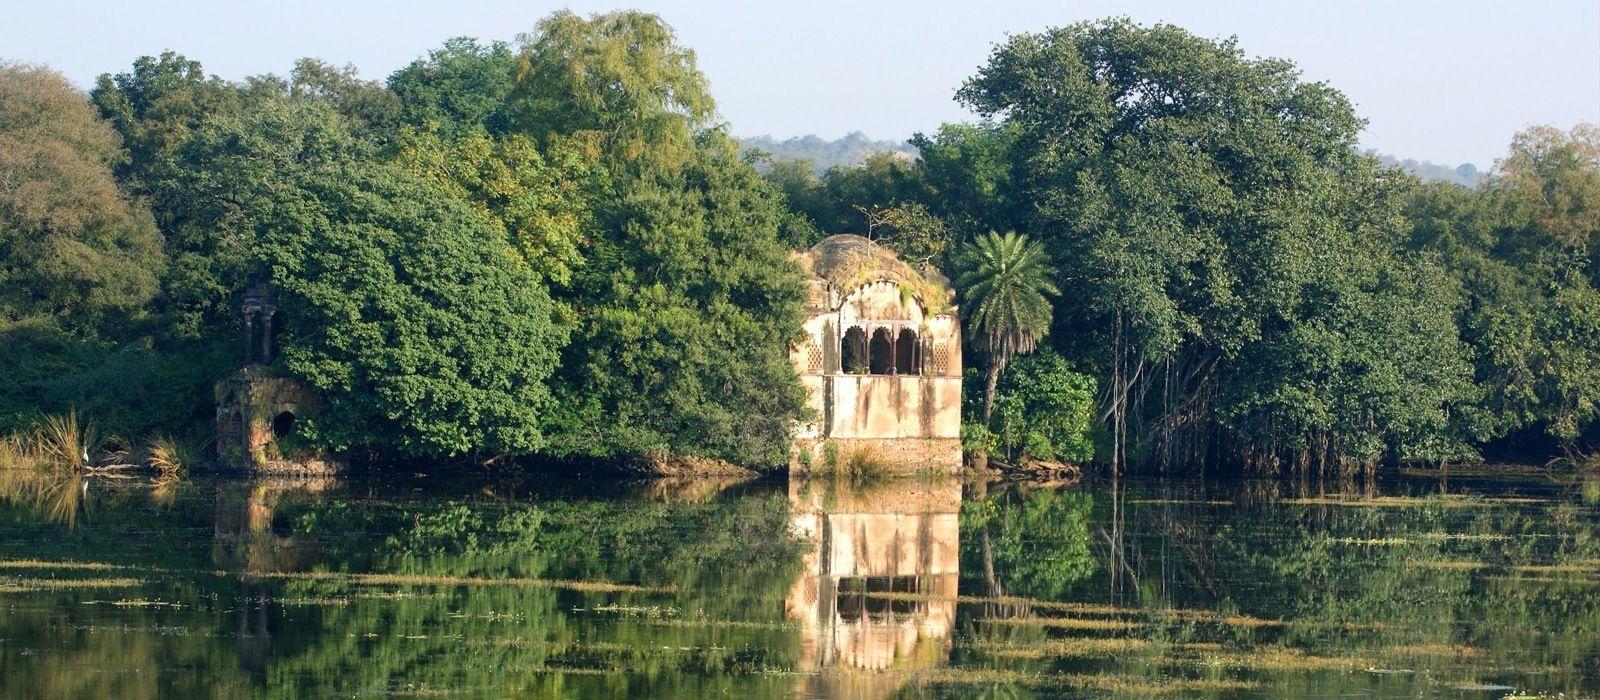 Nordindien Rundreise: Städte, Tempel & Safaris Urlaub 2